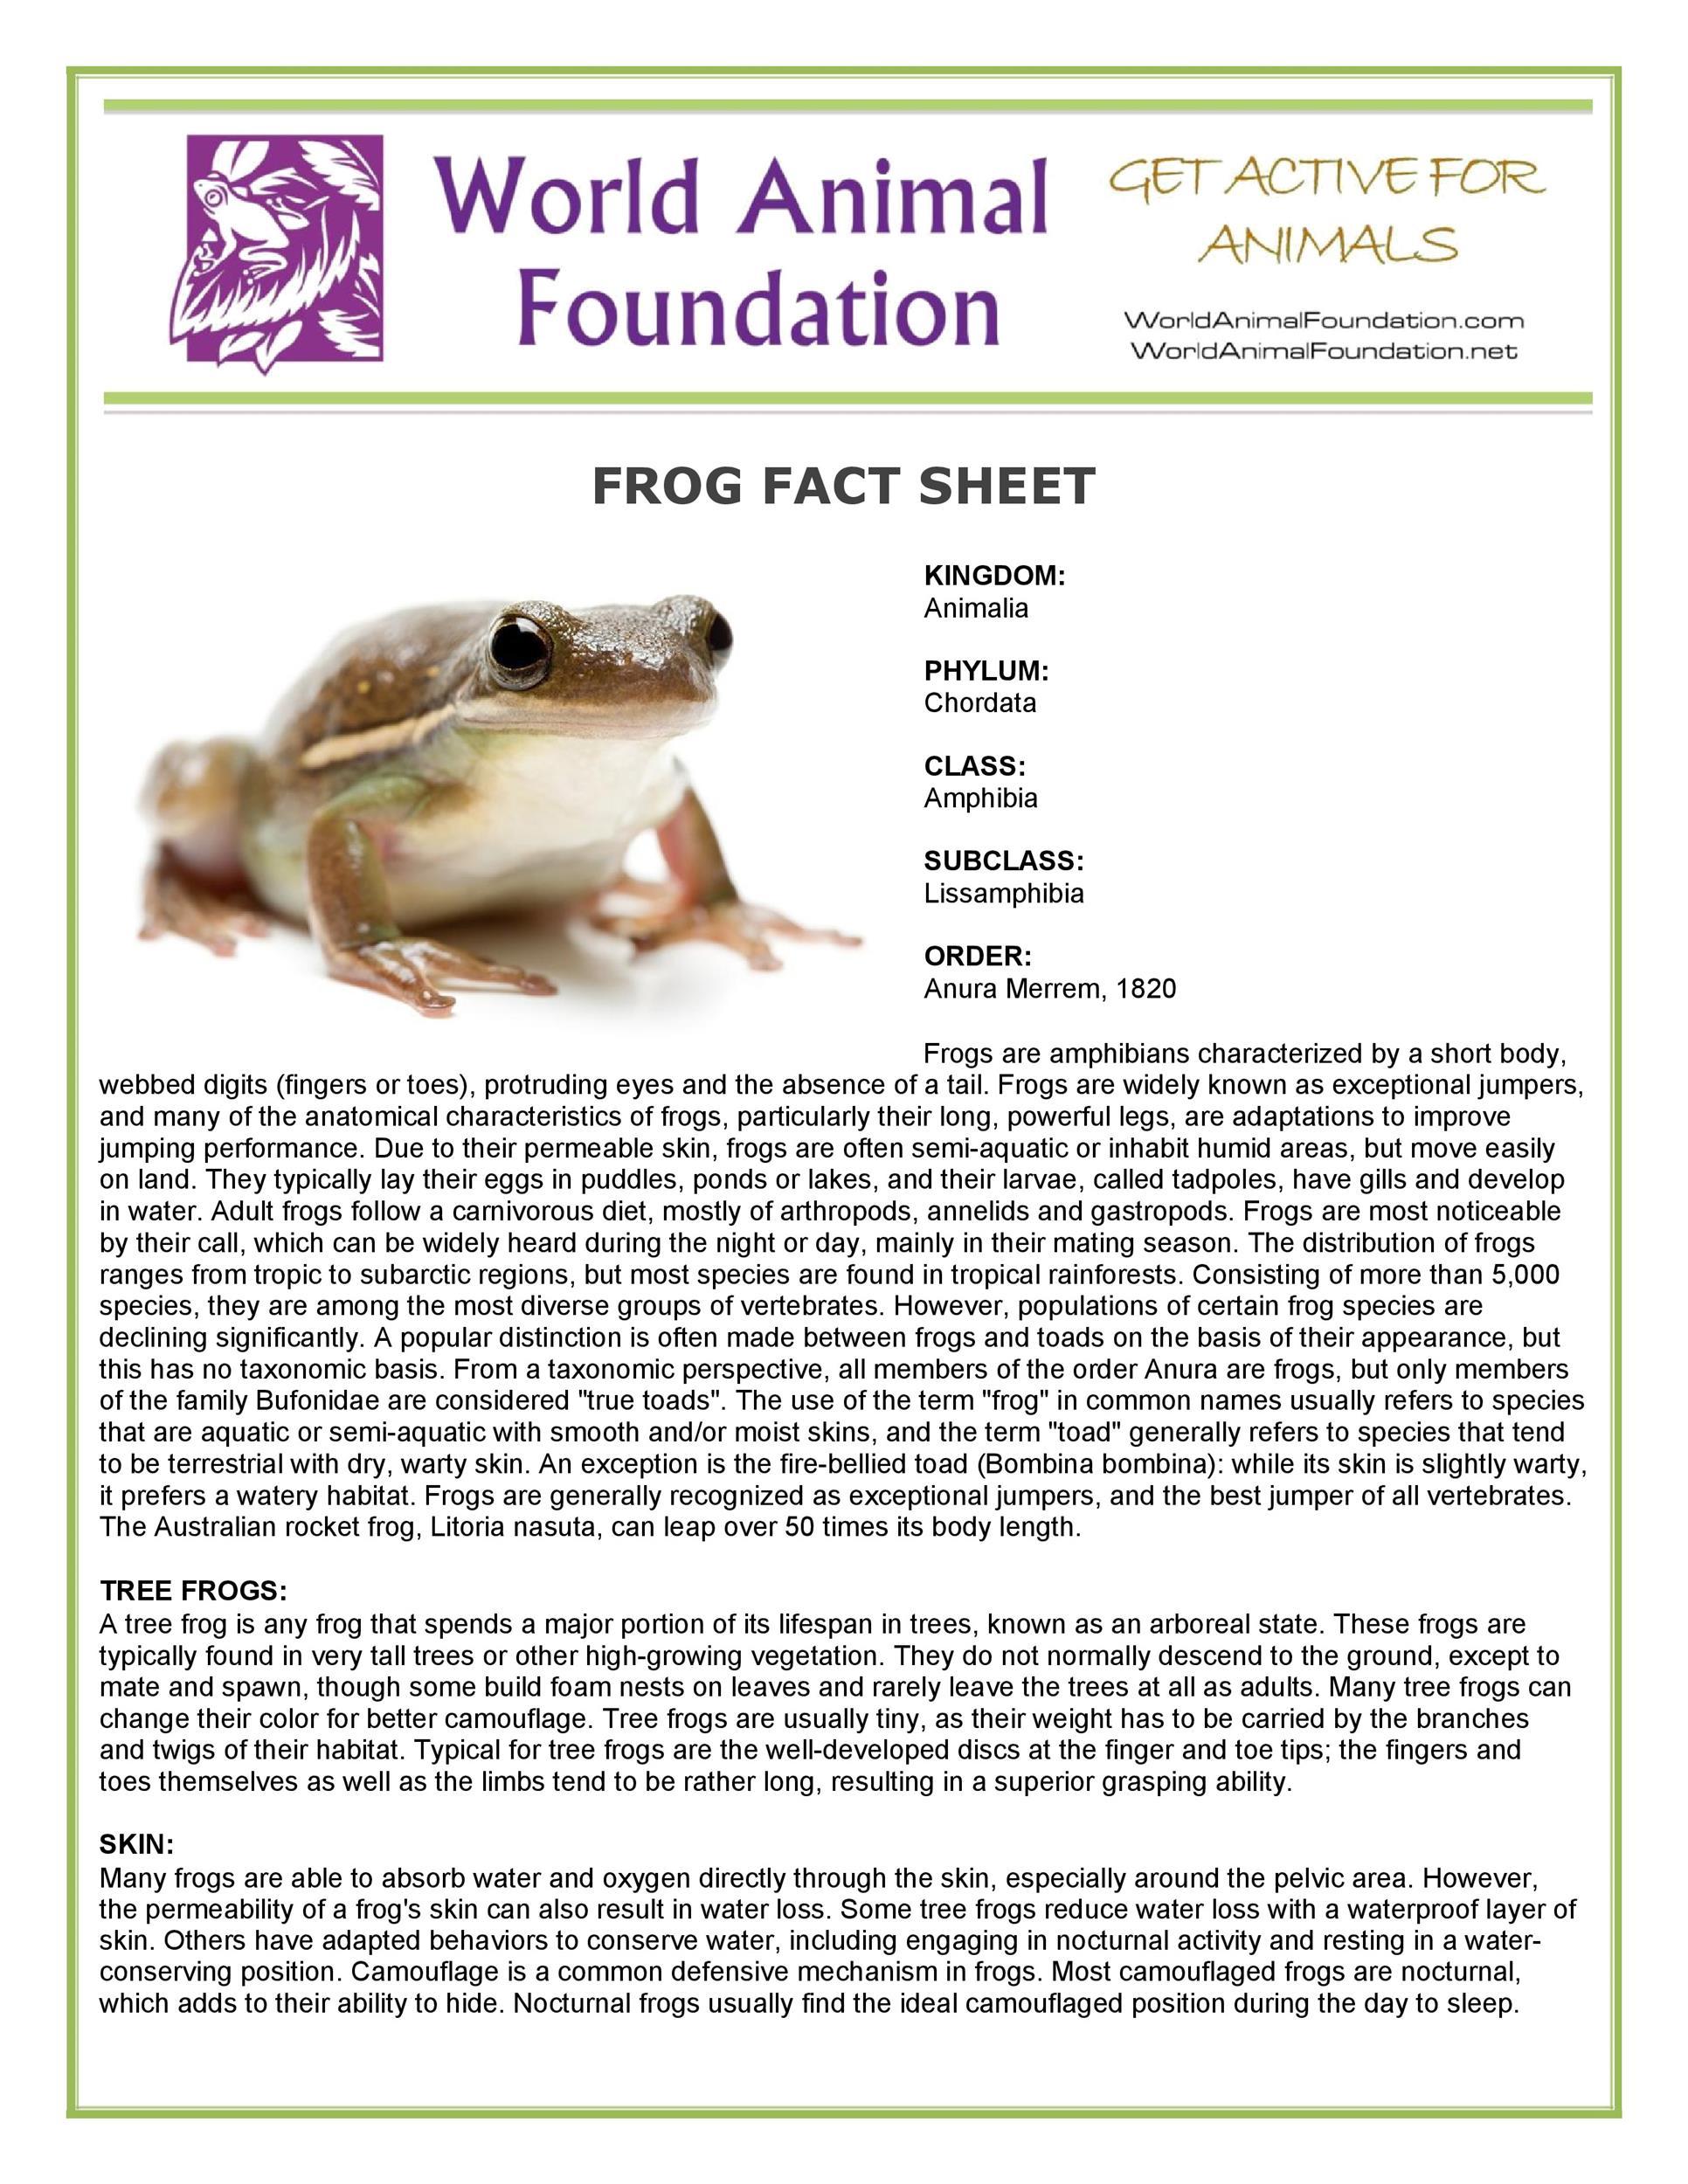 Free Fact sheet Template 60